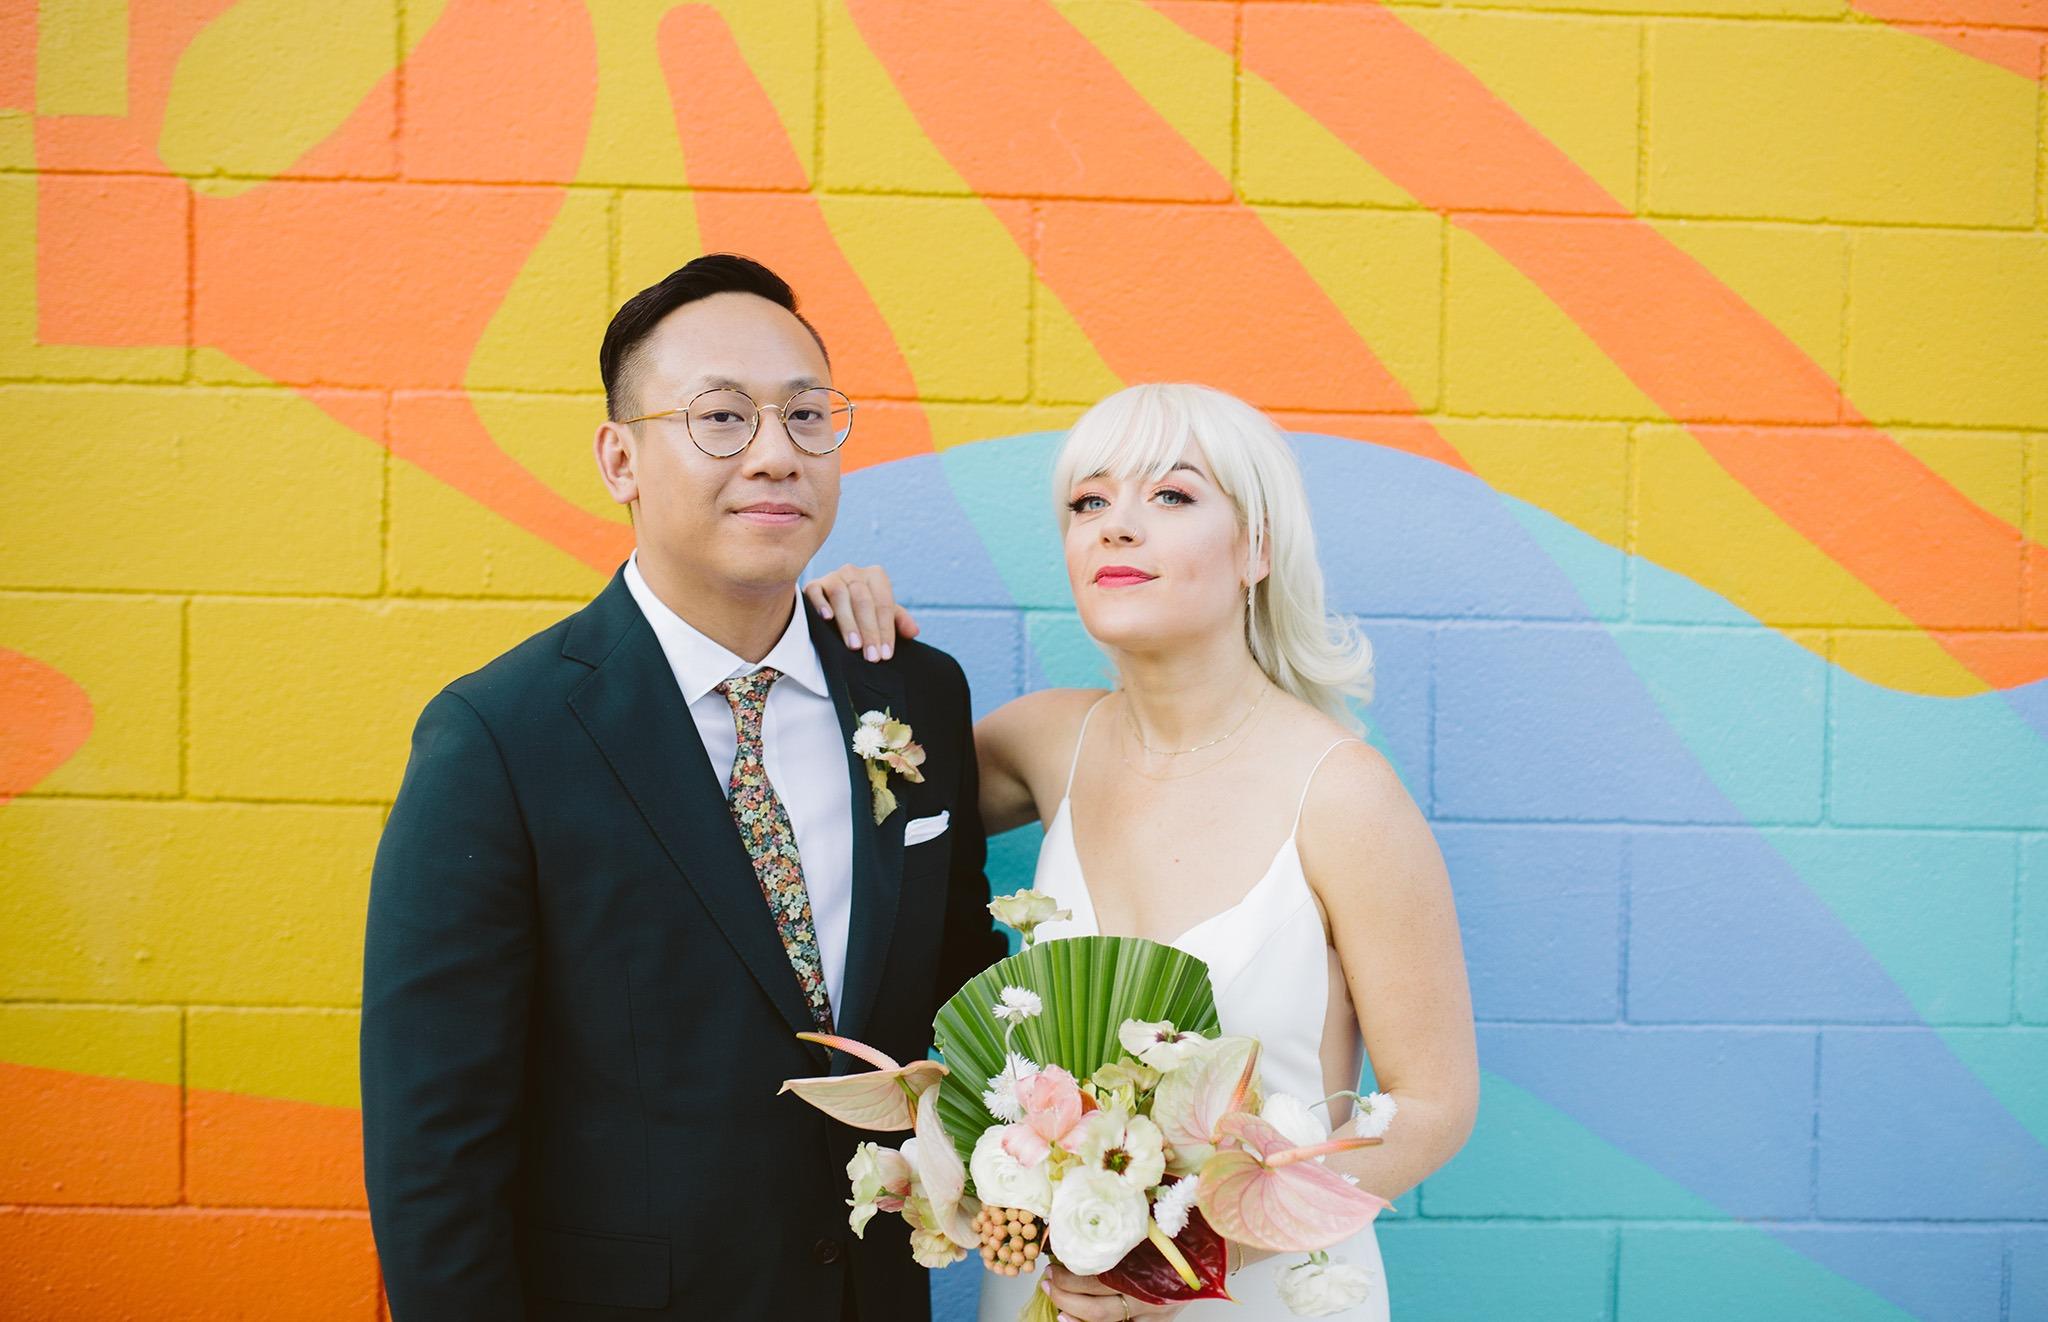 Ace Palm springs wedding